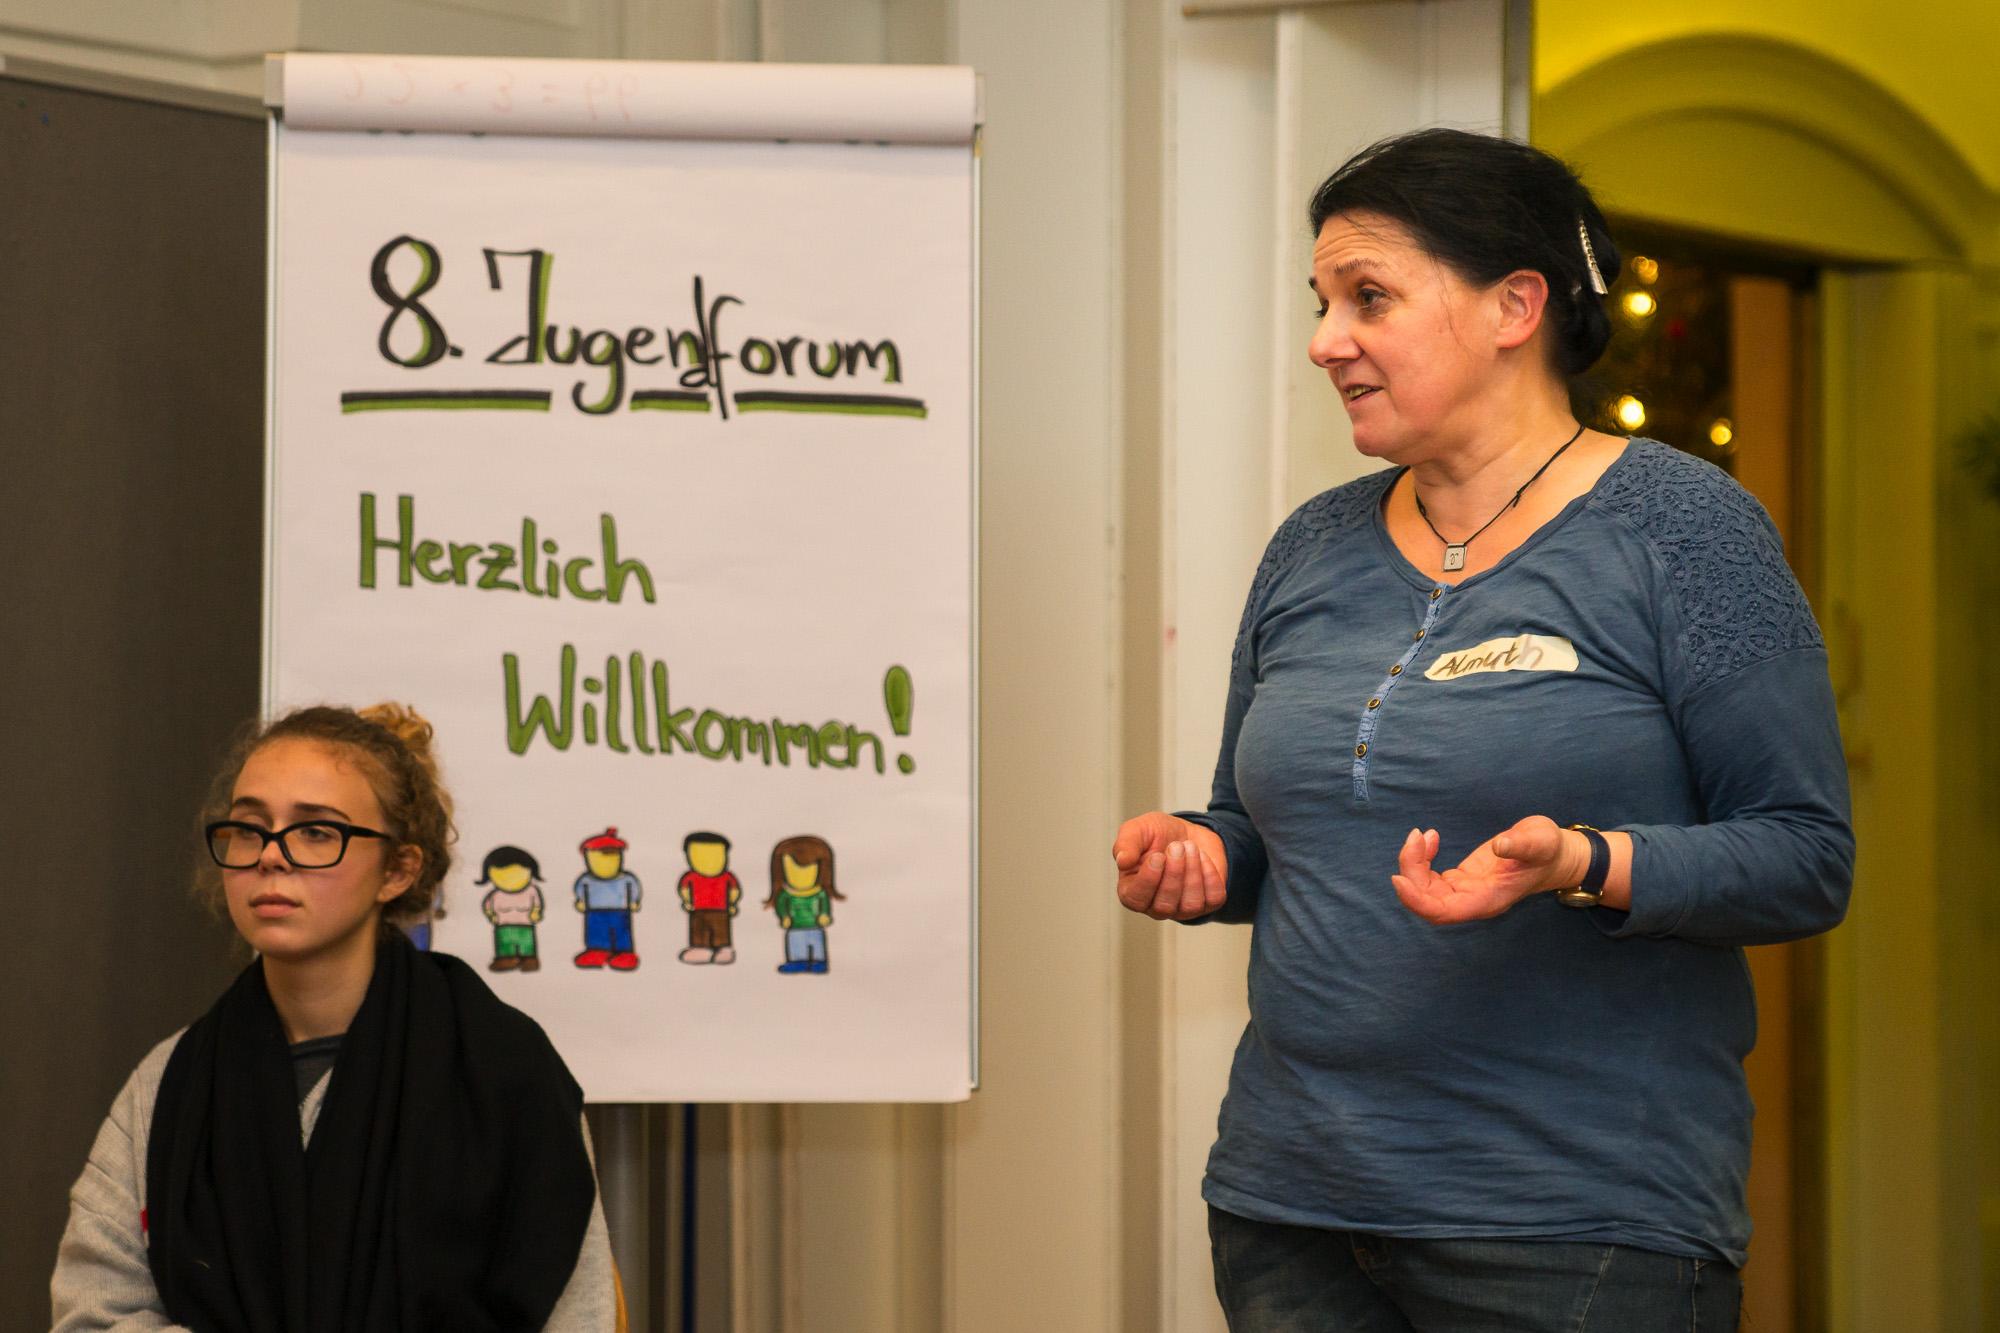 po_Blog_Jugendforum_BildimText_Eröffnung_(c)BenediktBungarten-2